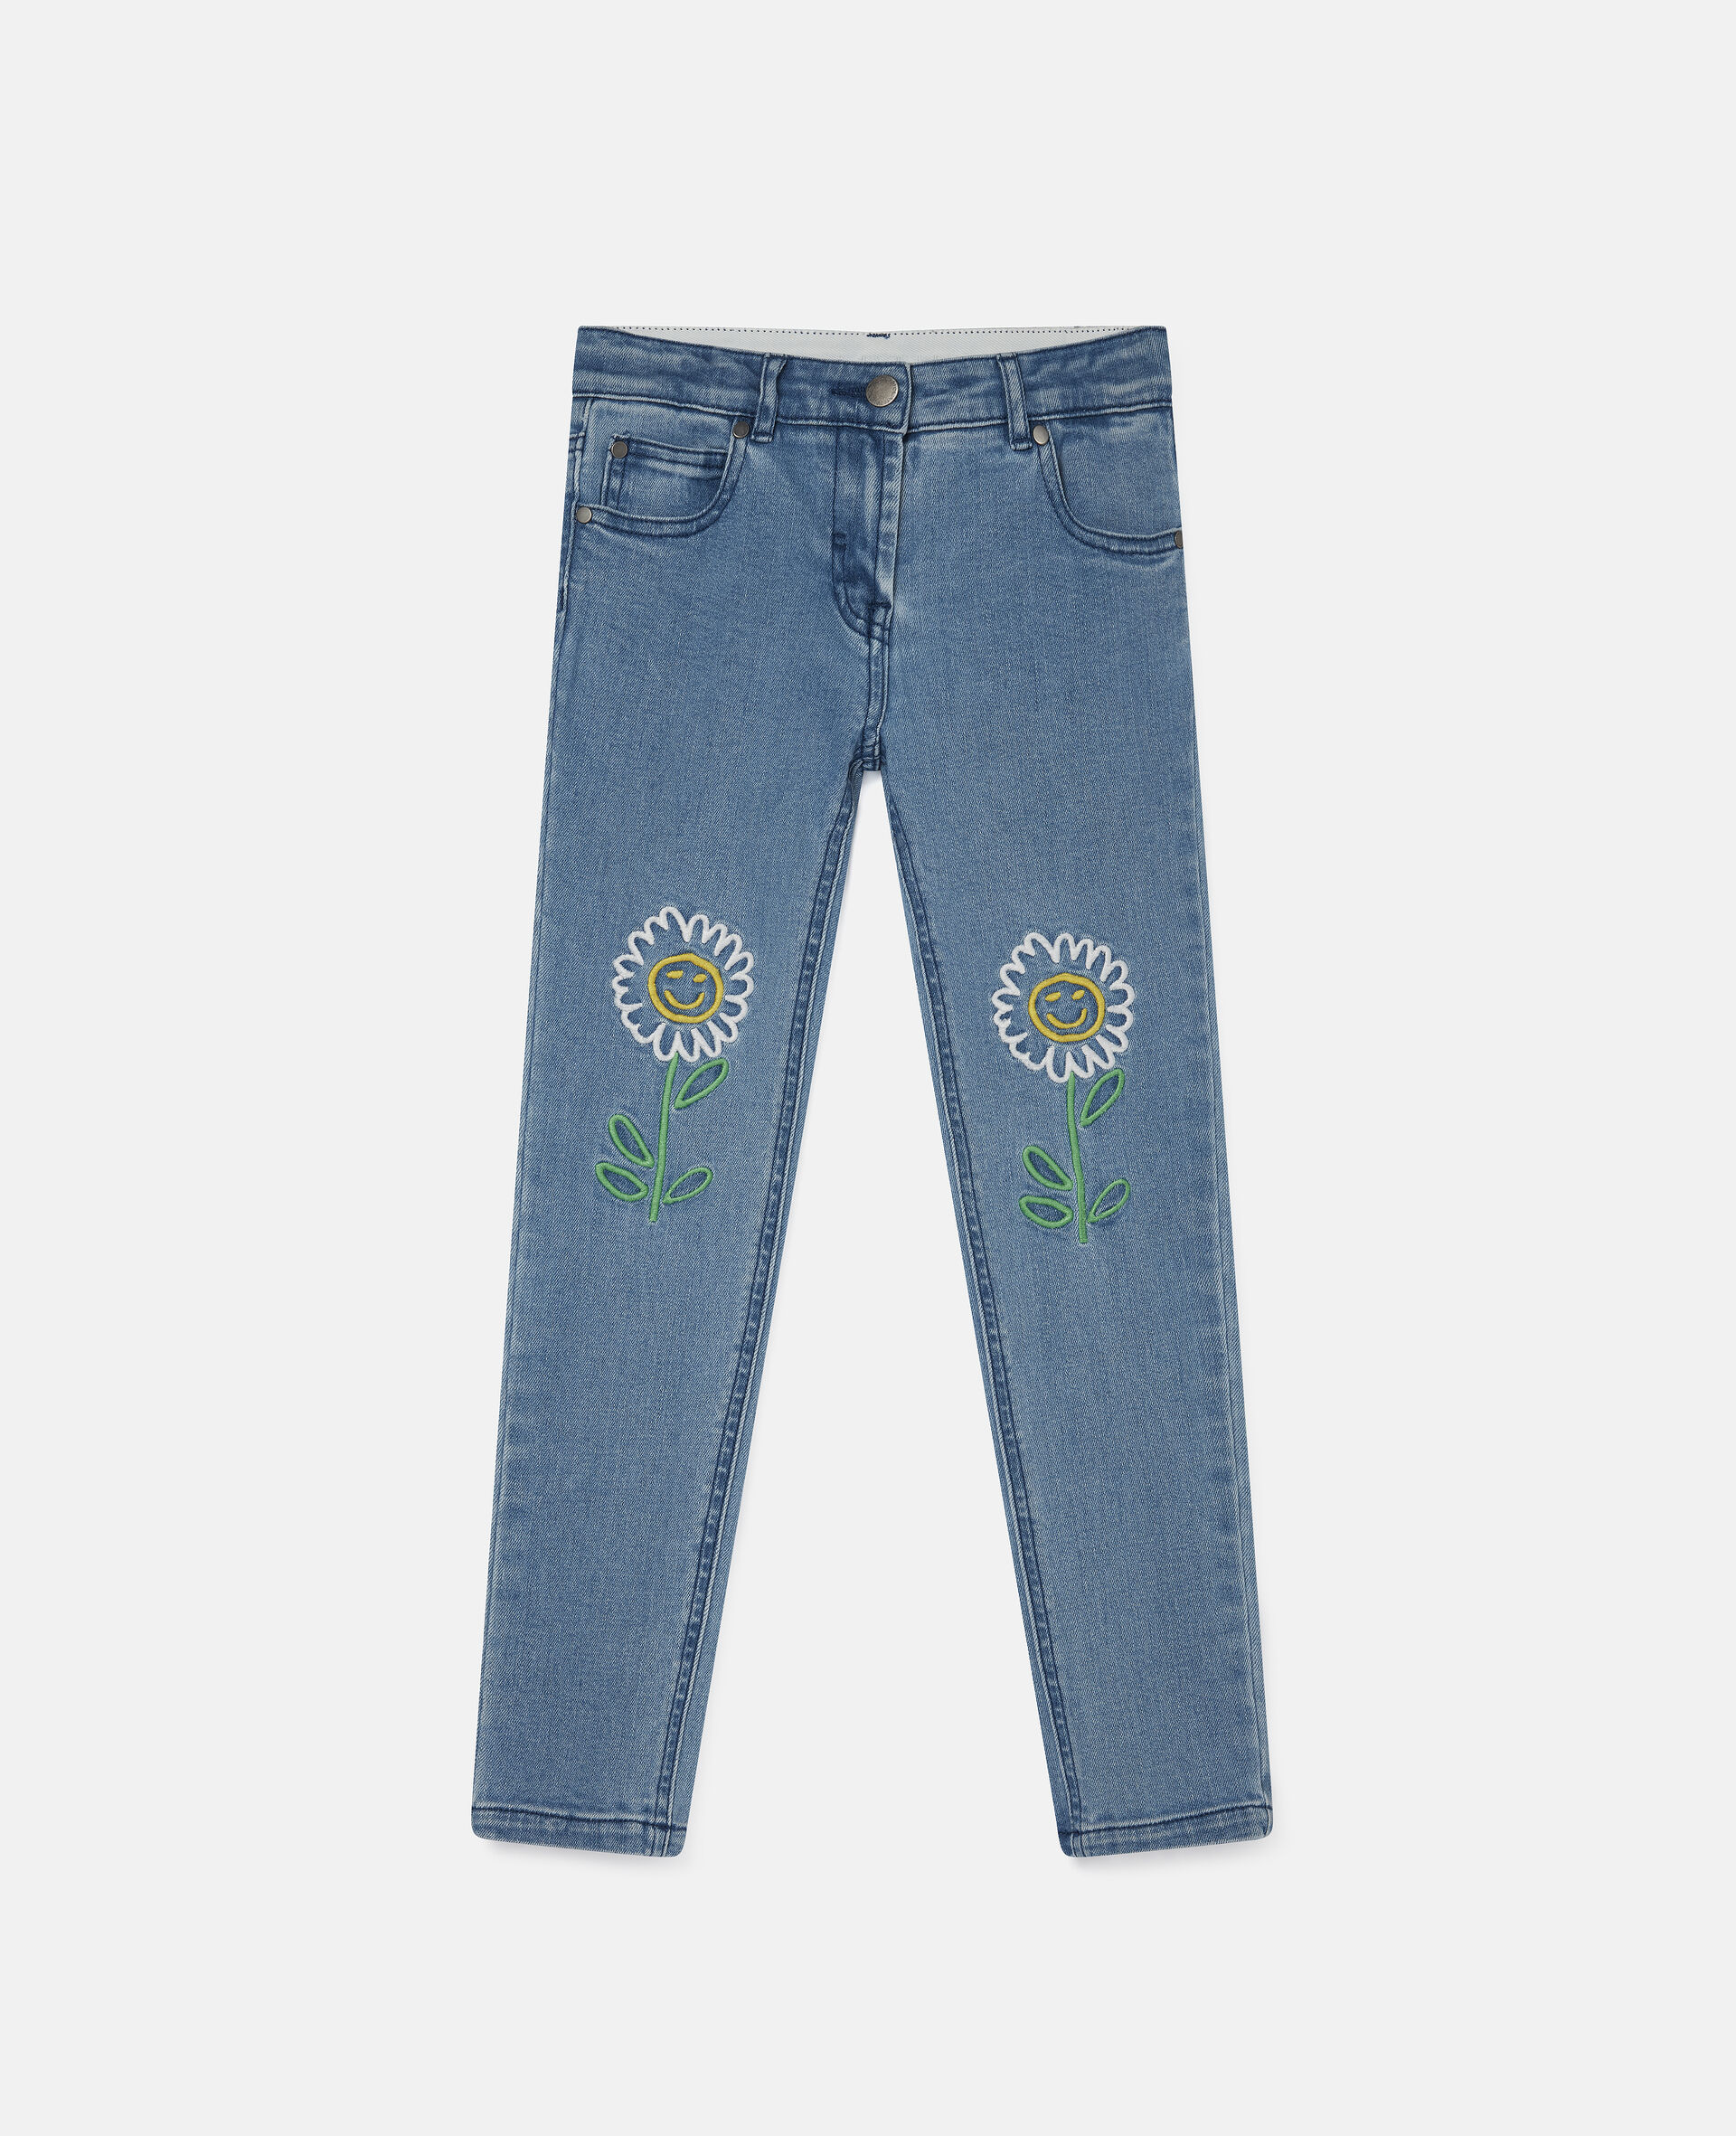 Embroidered Flowers Denim Pants-Blue-large image number 0